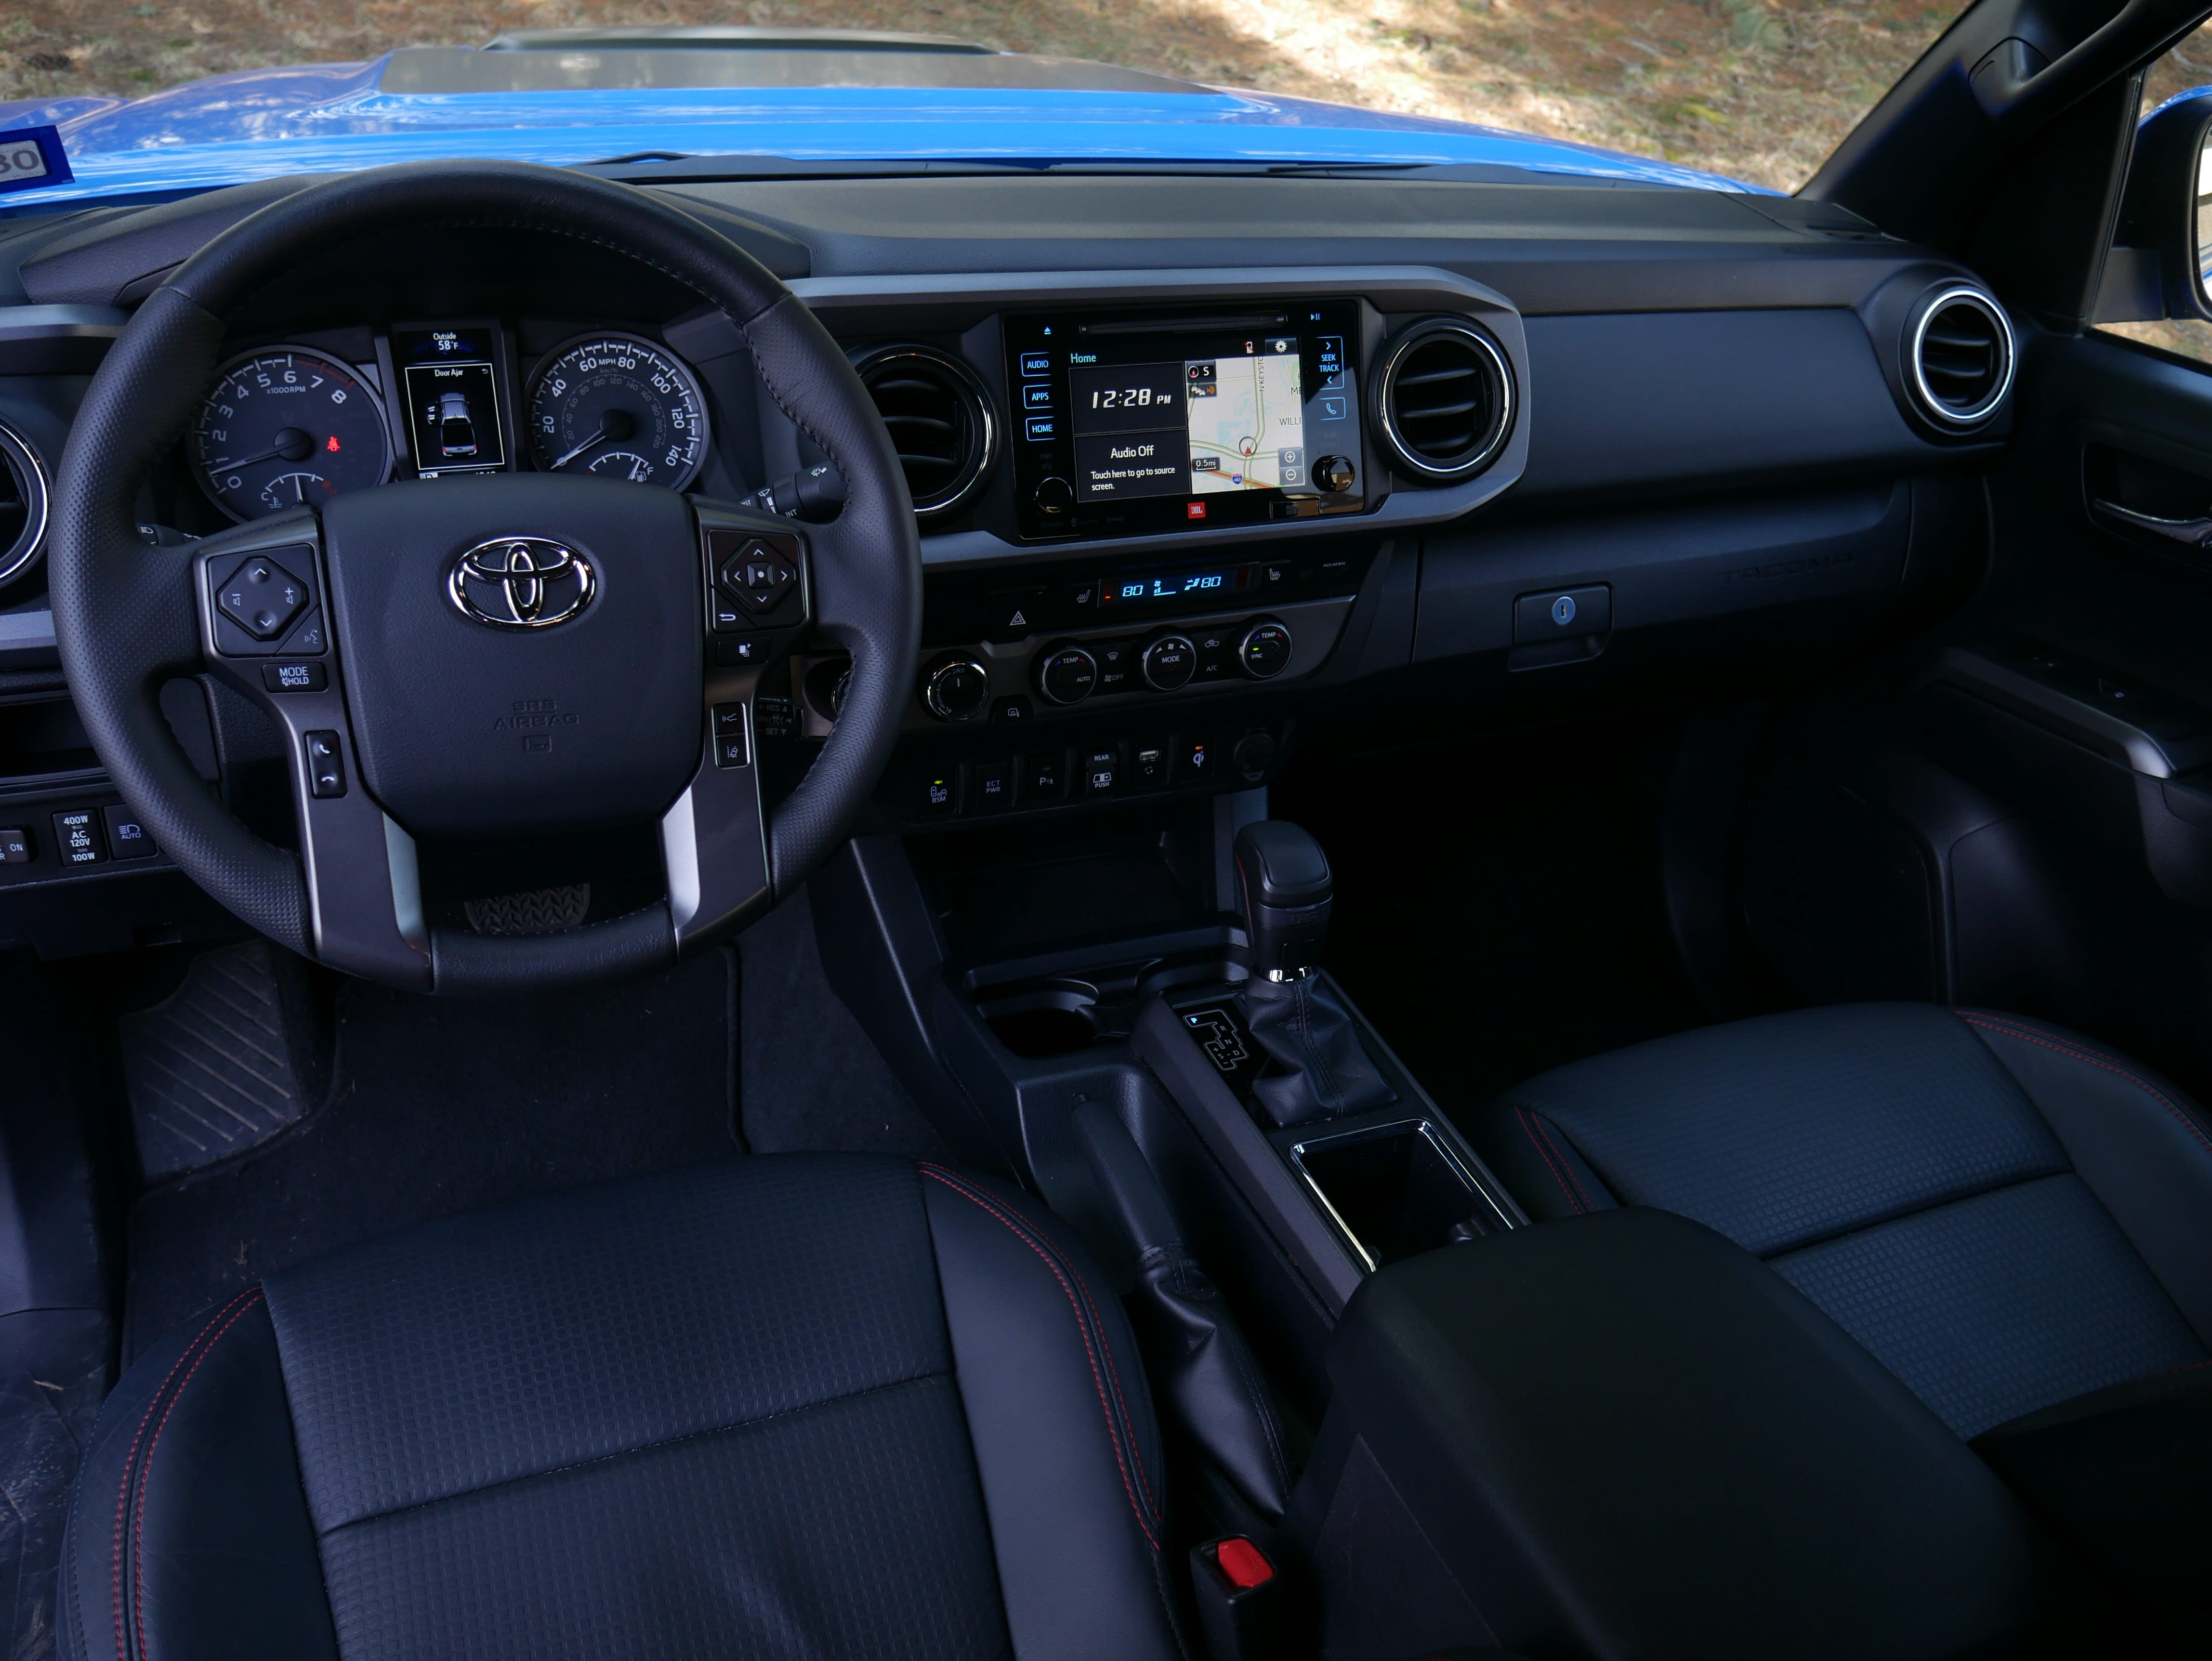 2019 Toyota Tacoma TRD Pro Dash